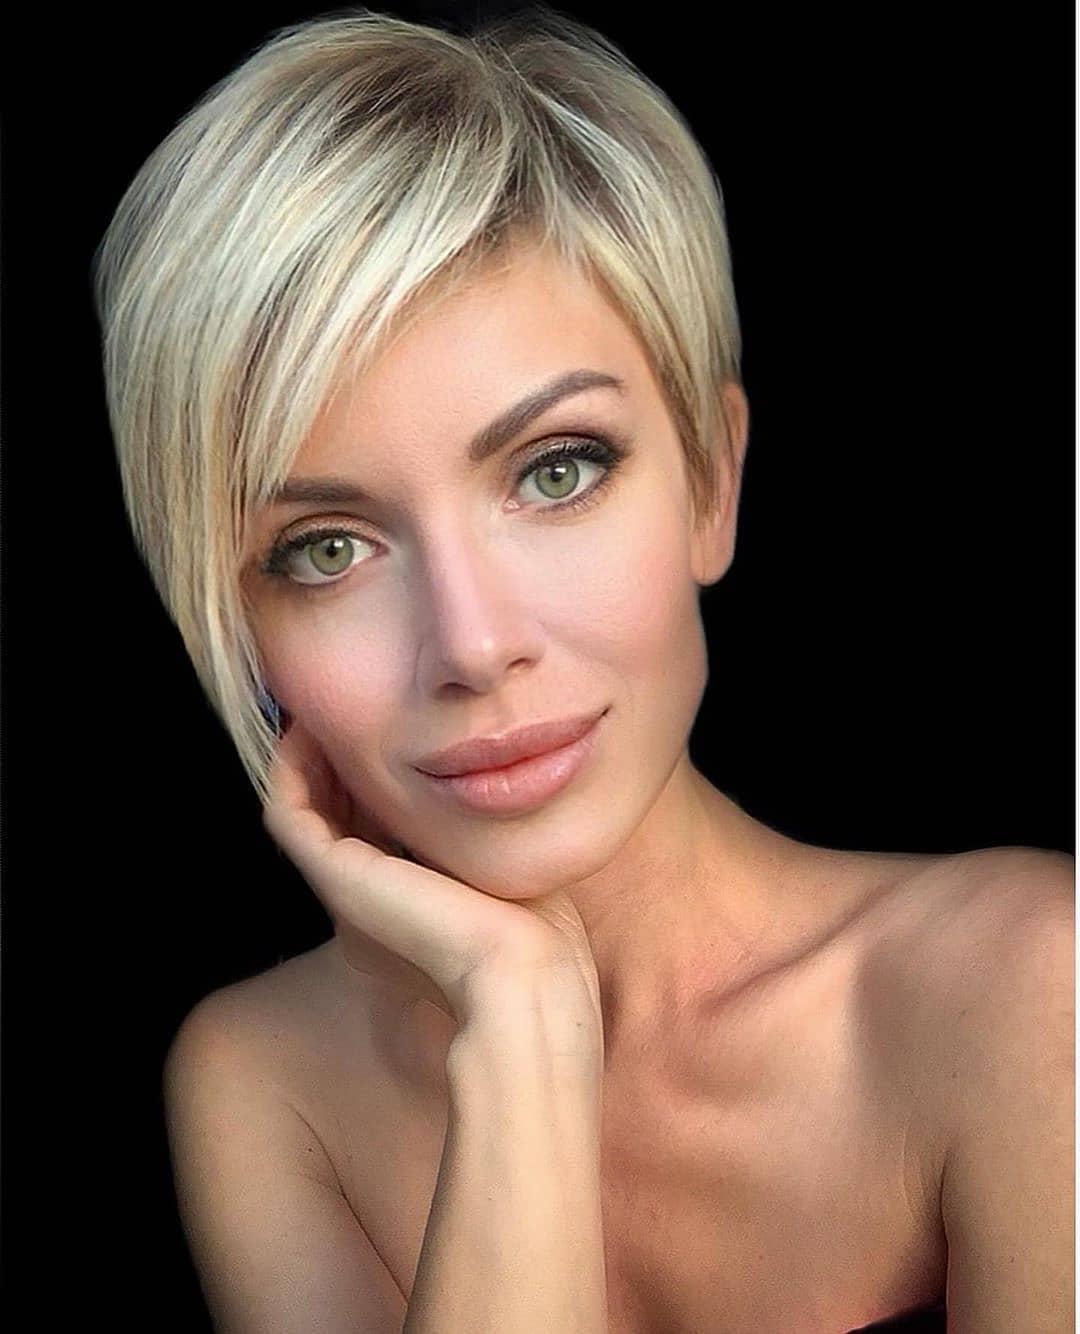 @tatiana_lavsky